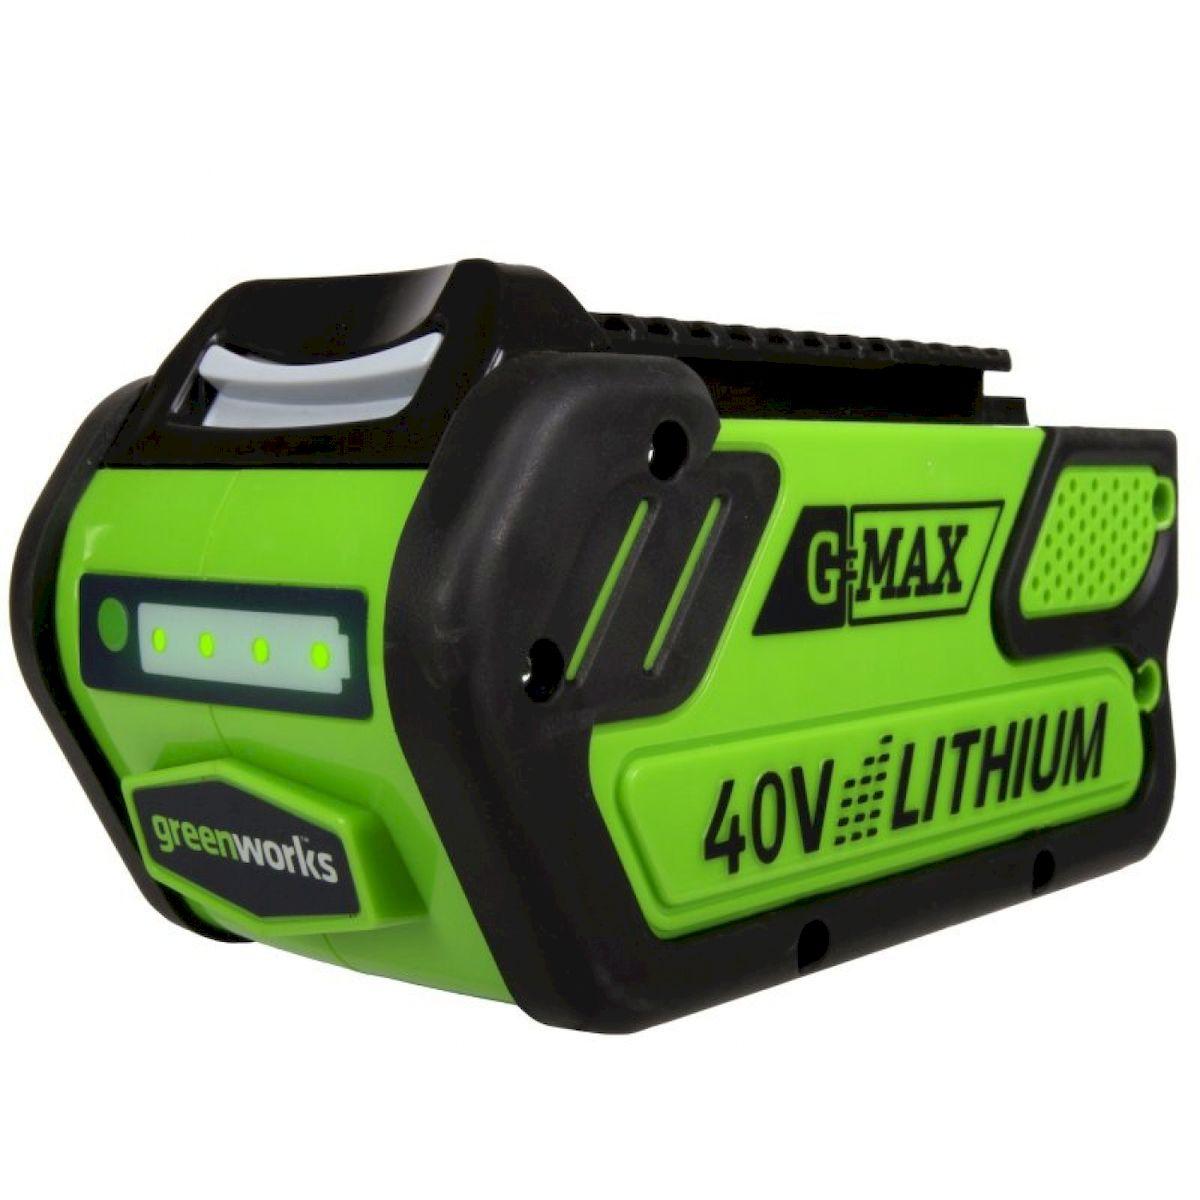 Литий-Ионная аккумуляторная батарея GreenWorks 40В 4Аh